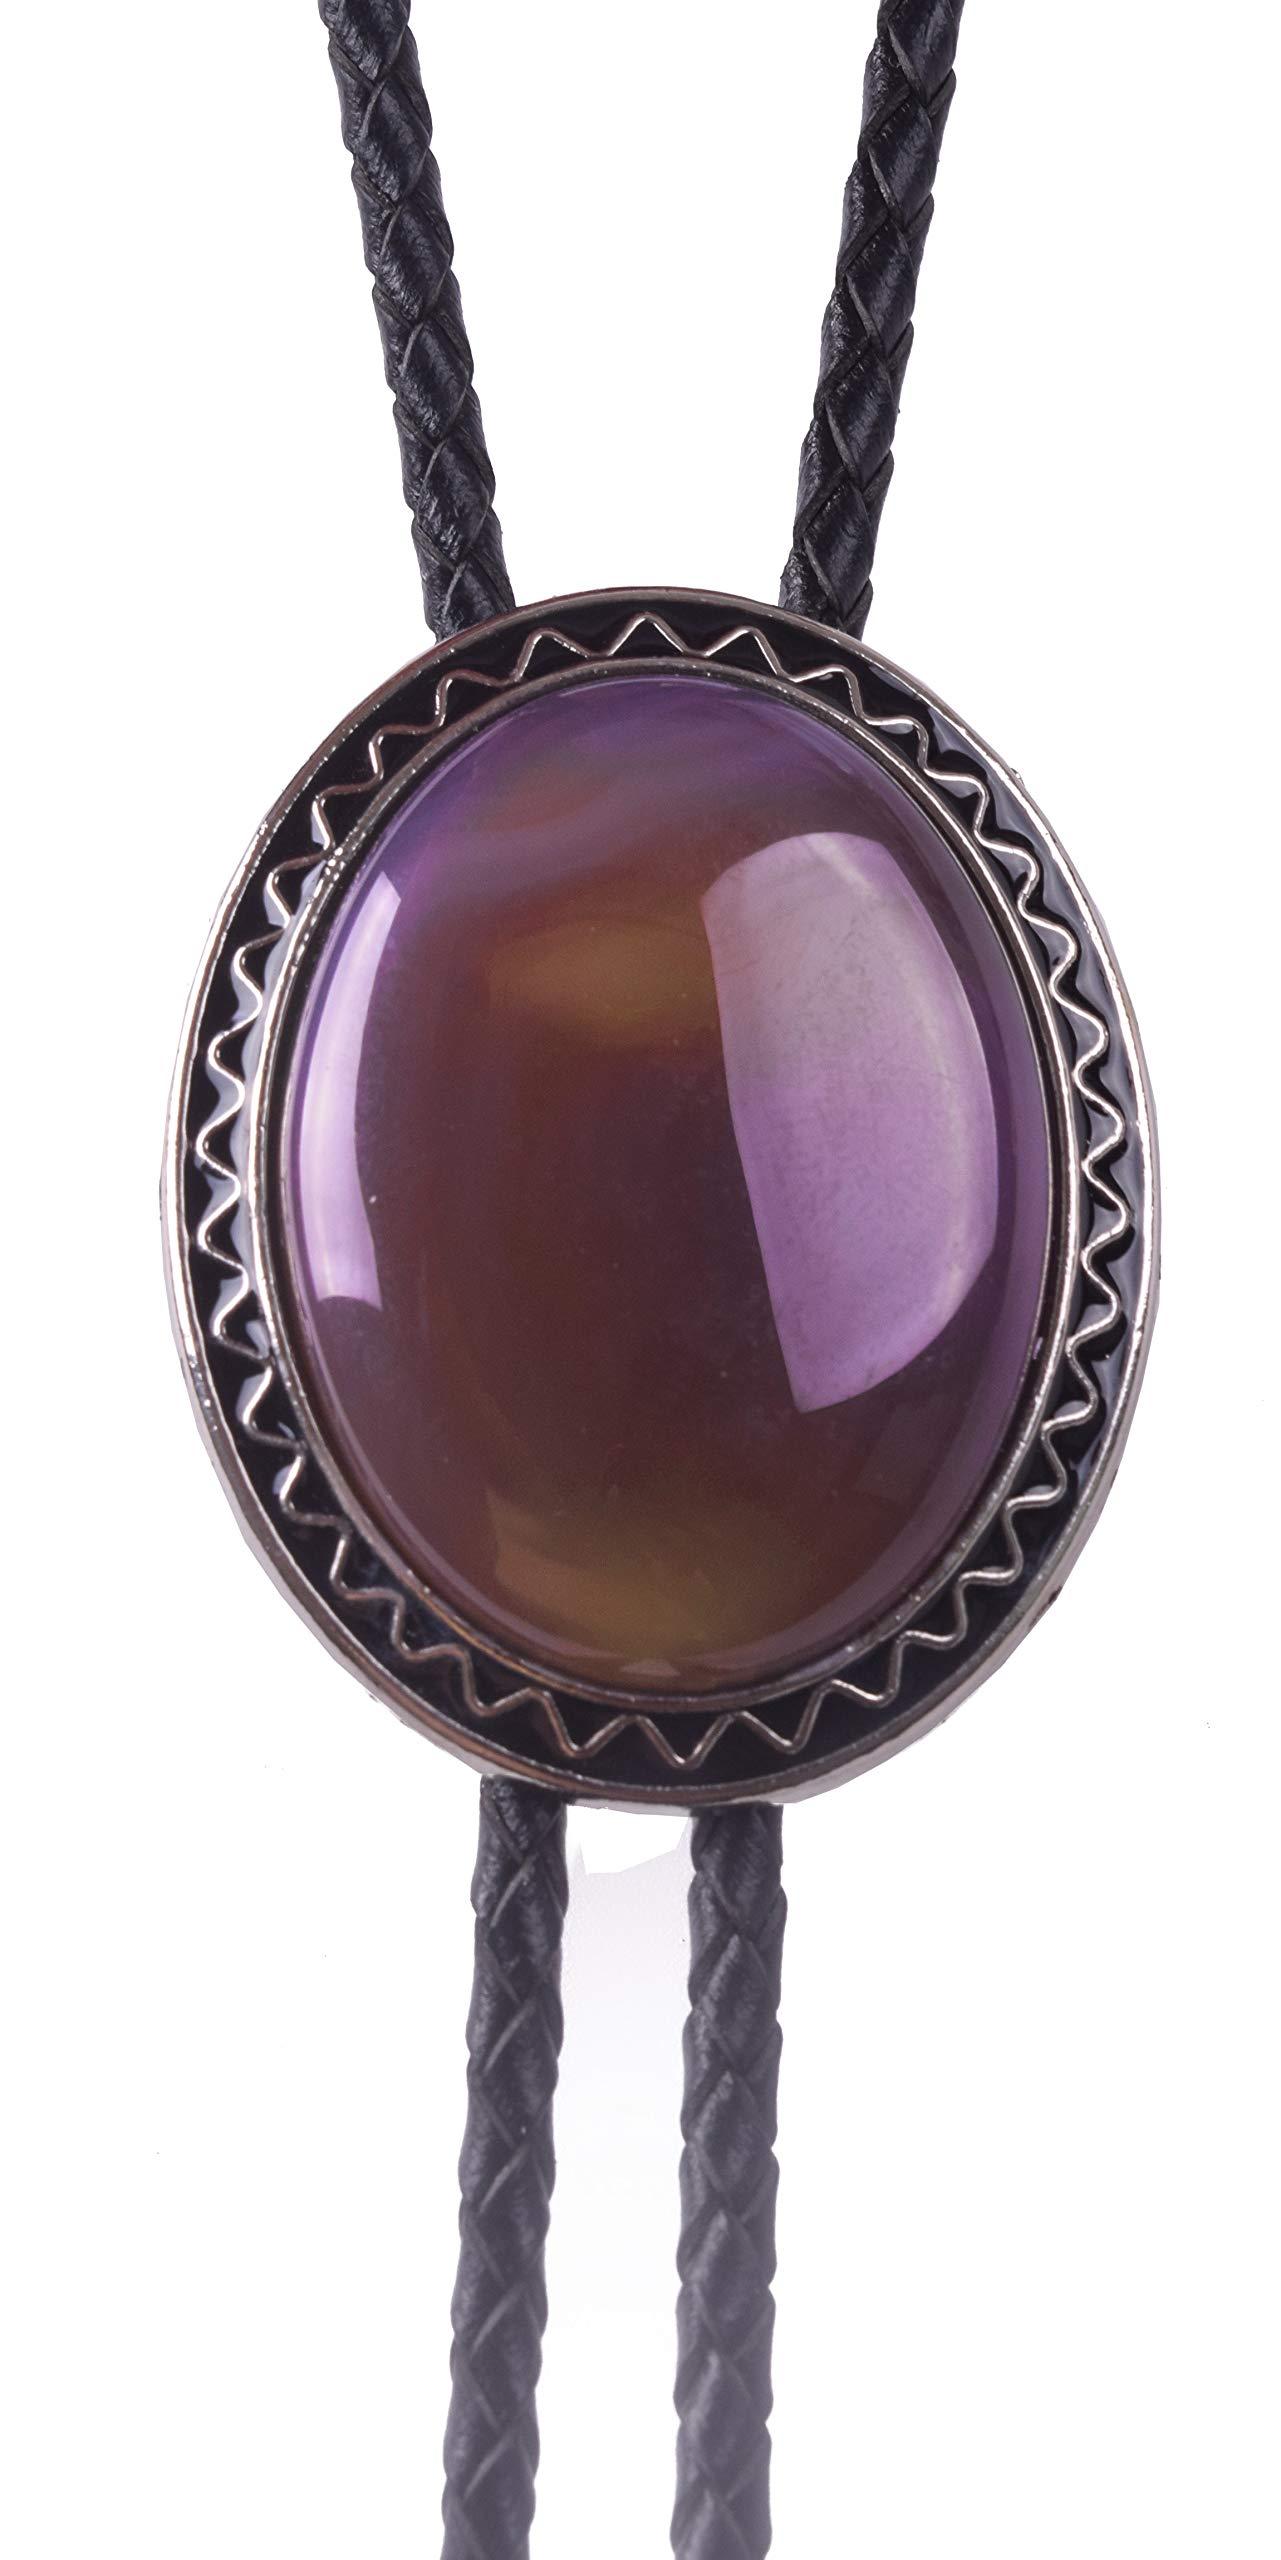 Yuanmo Bolo Tie Natural Purple Agate Stone Style Genuine Cowhide Rope